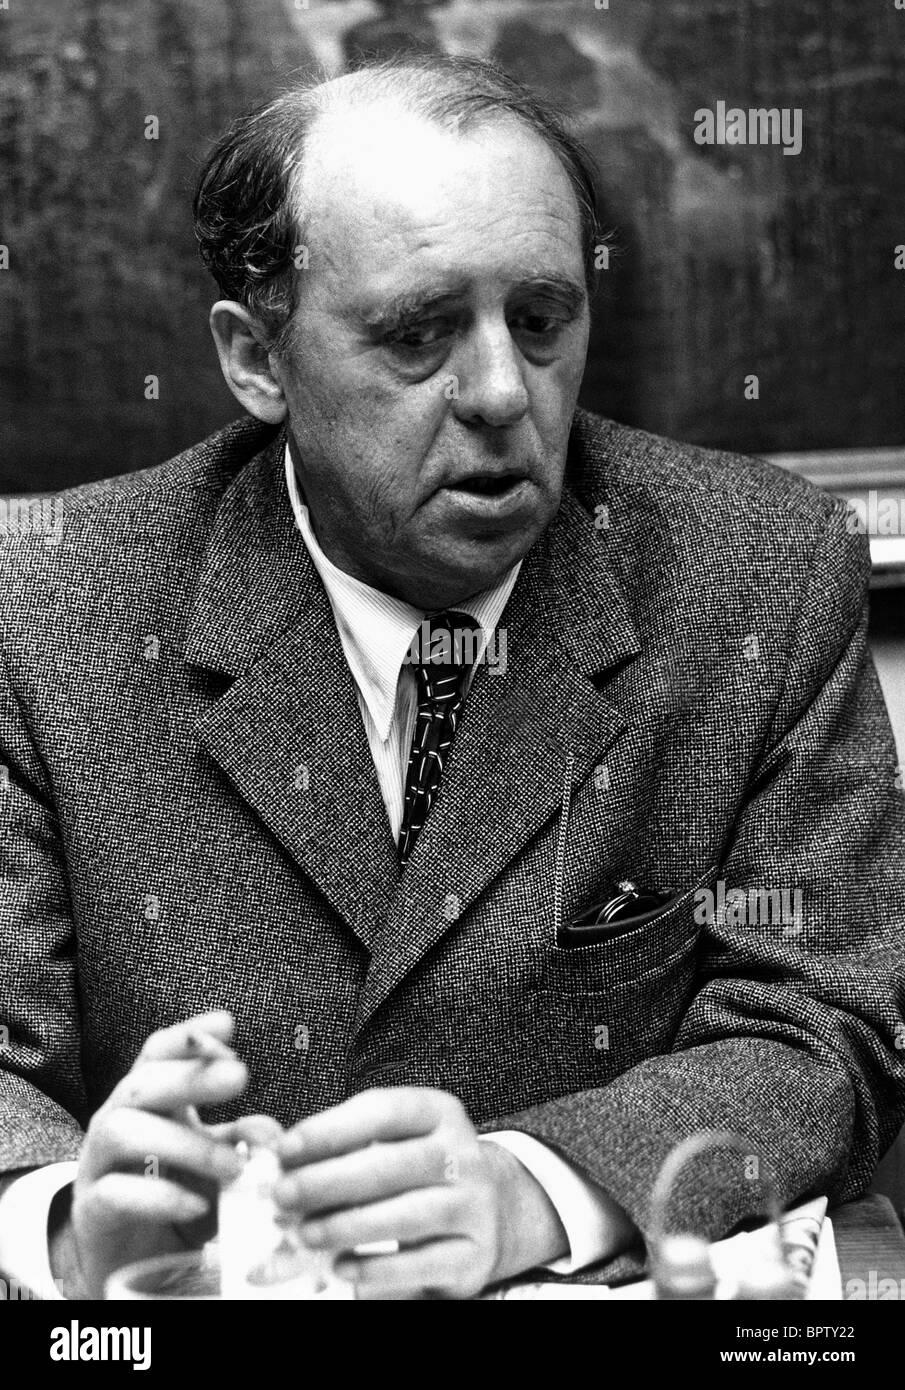 HEINRICH BOLL WRITER (1969) - Stock Image